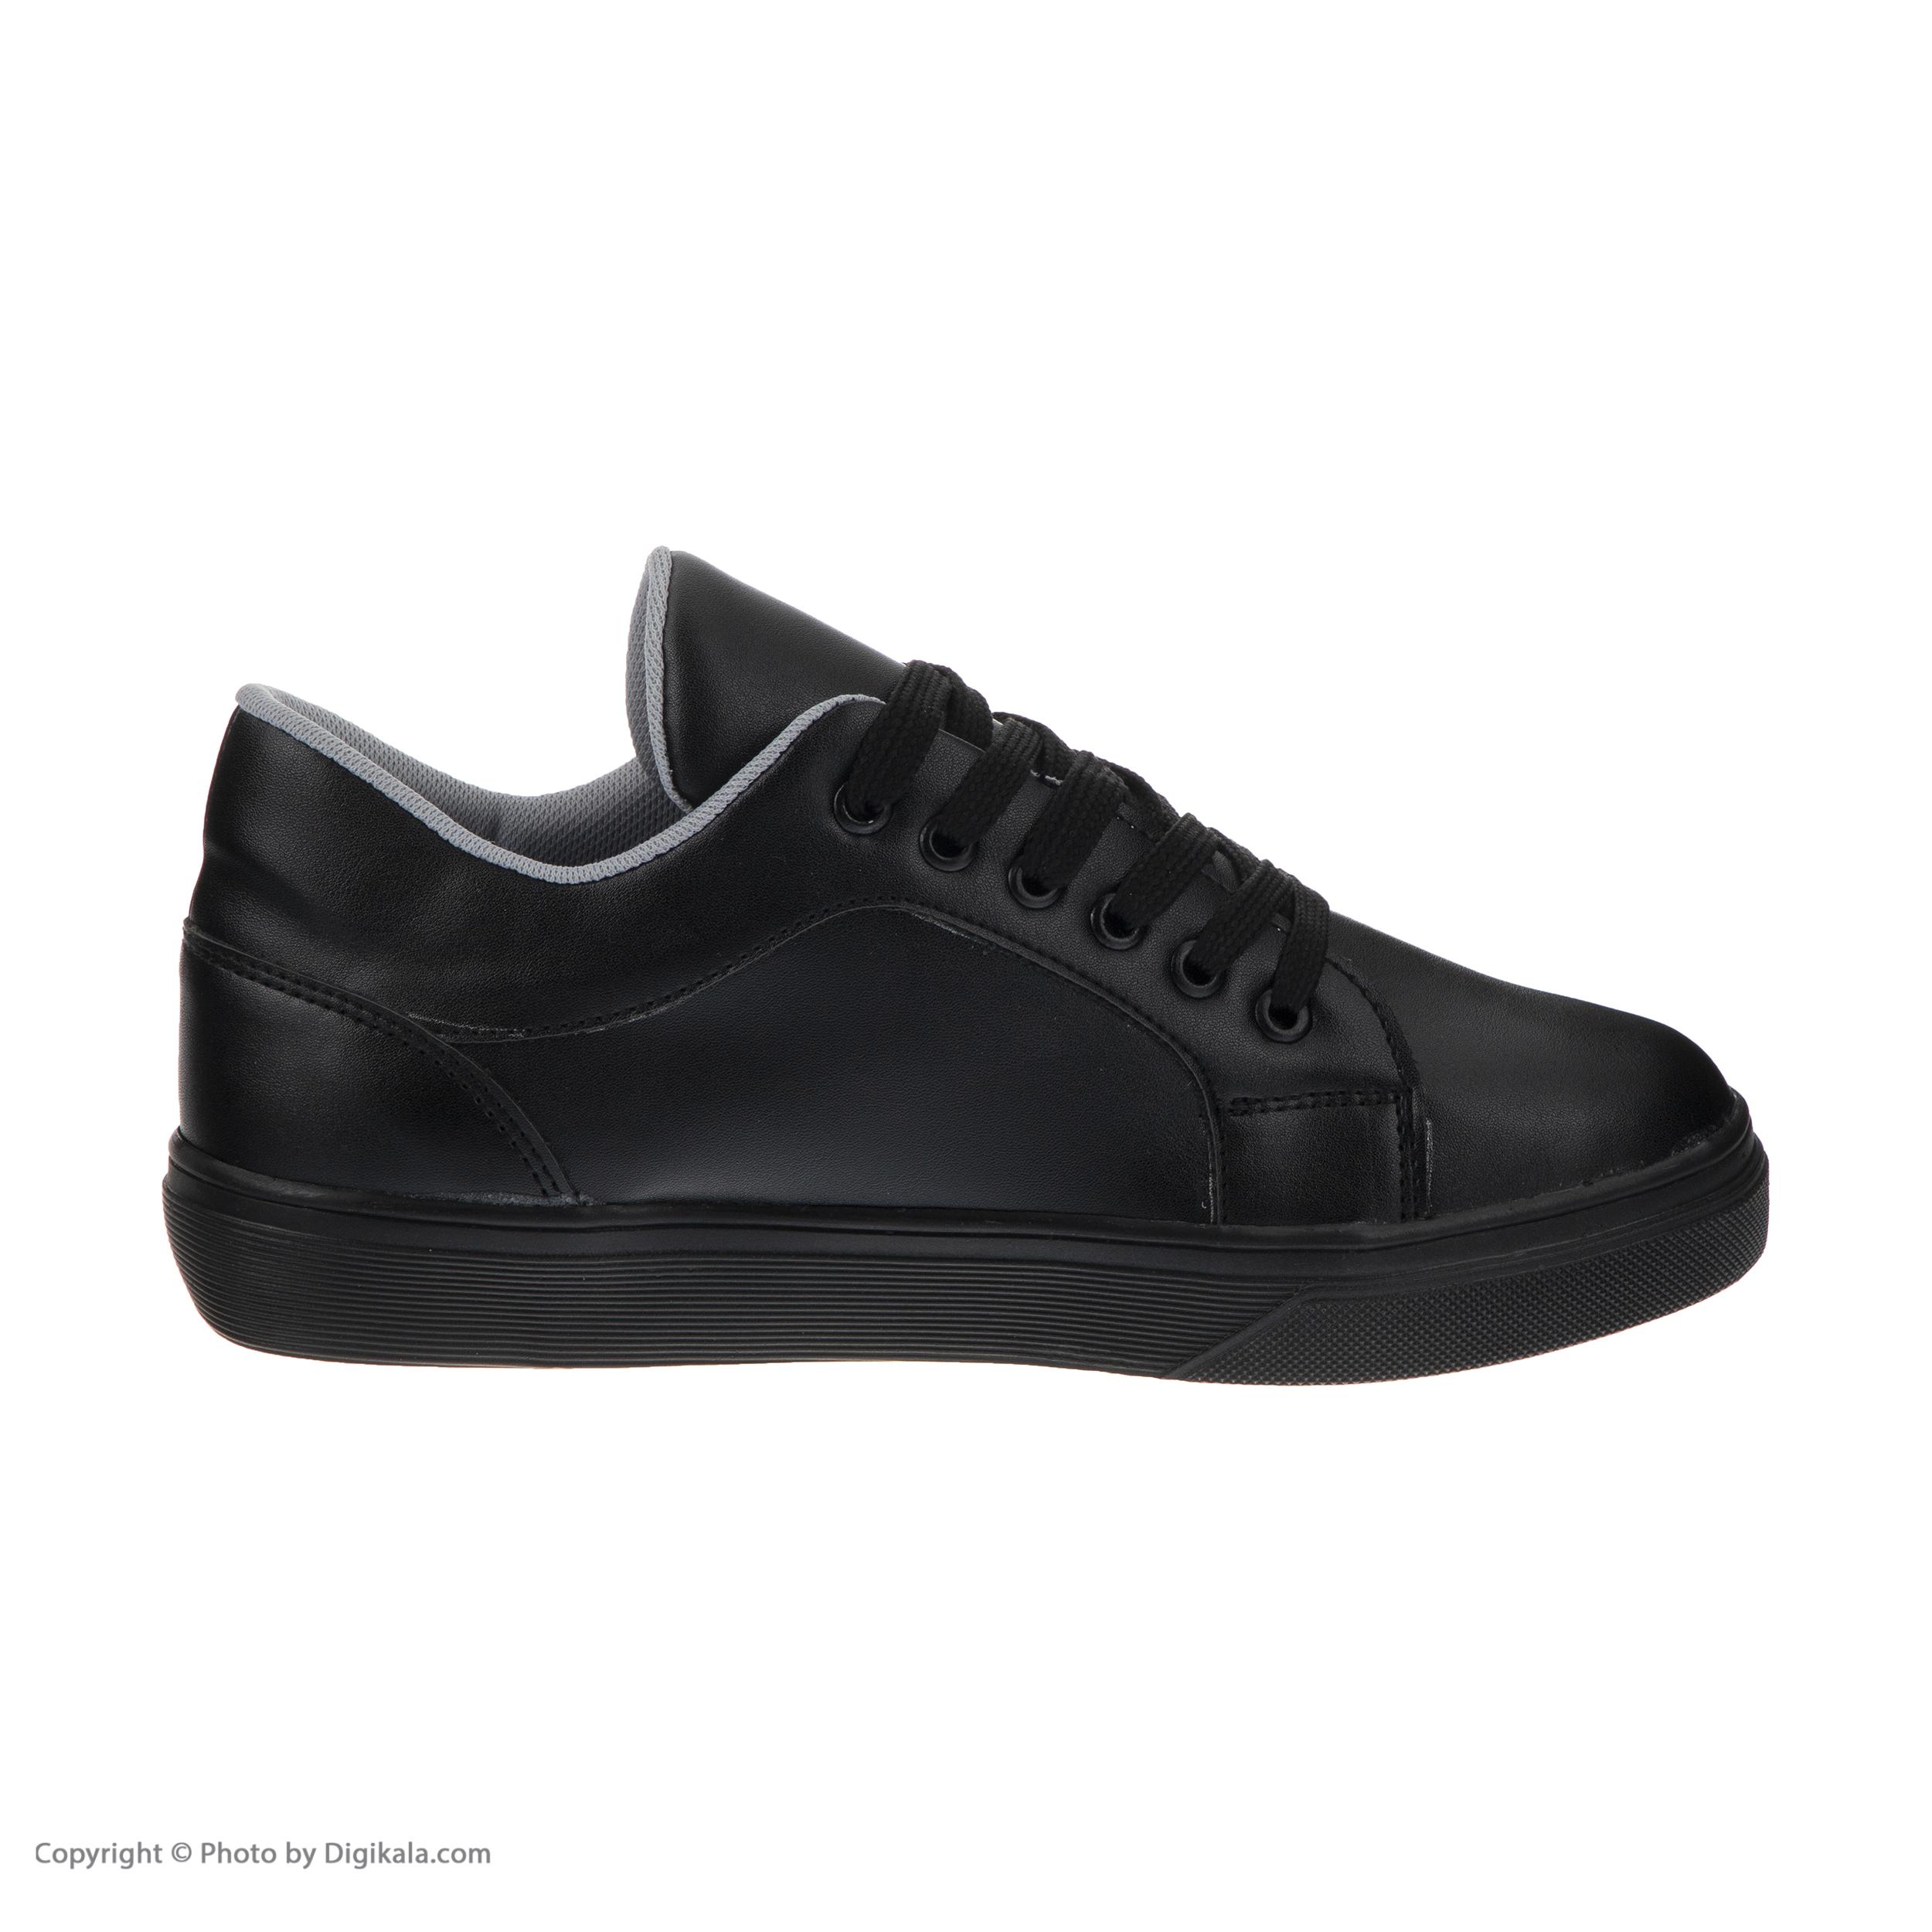 کفش روزمره زنانه مدل 4031 -  - 3